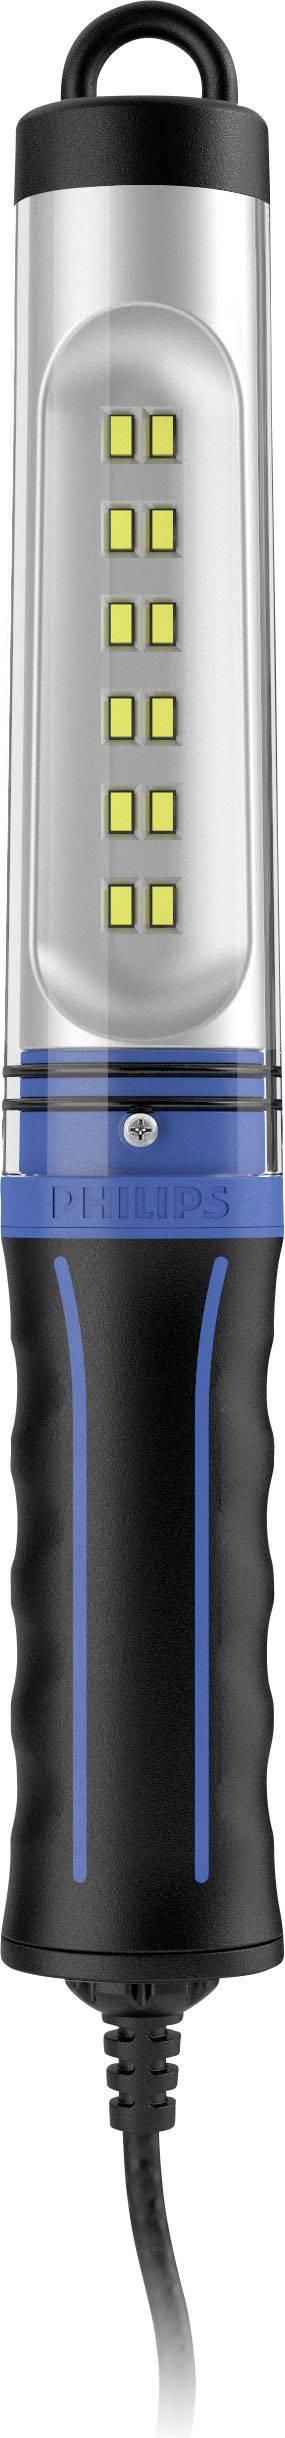 Philips LPL35X1 LED lampada con cavo CBL10